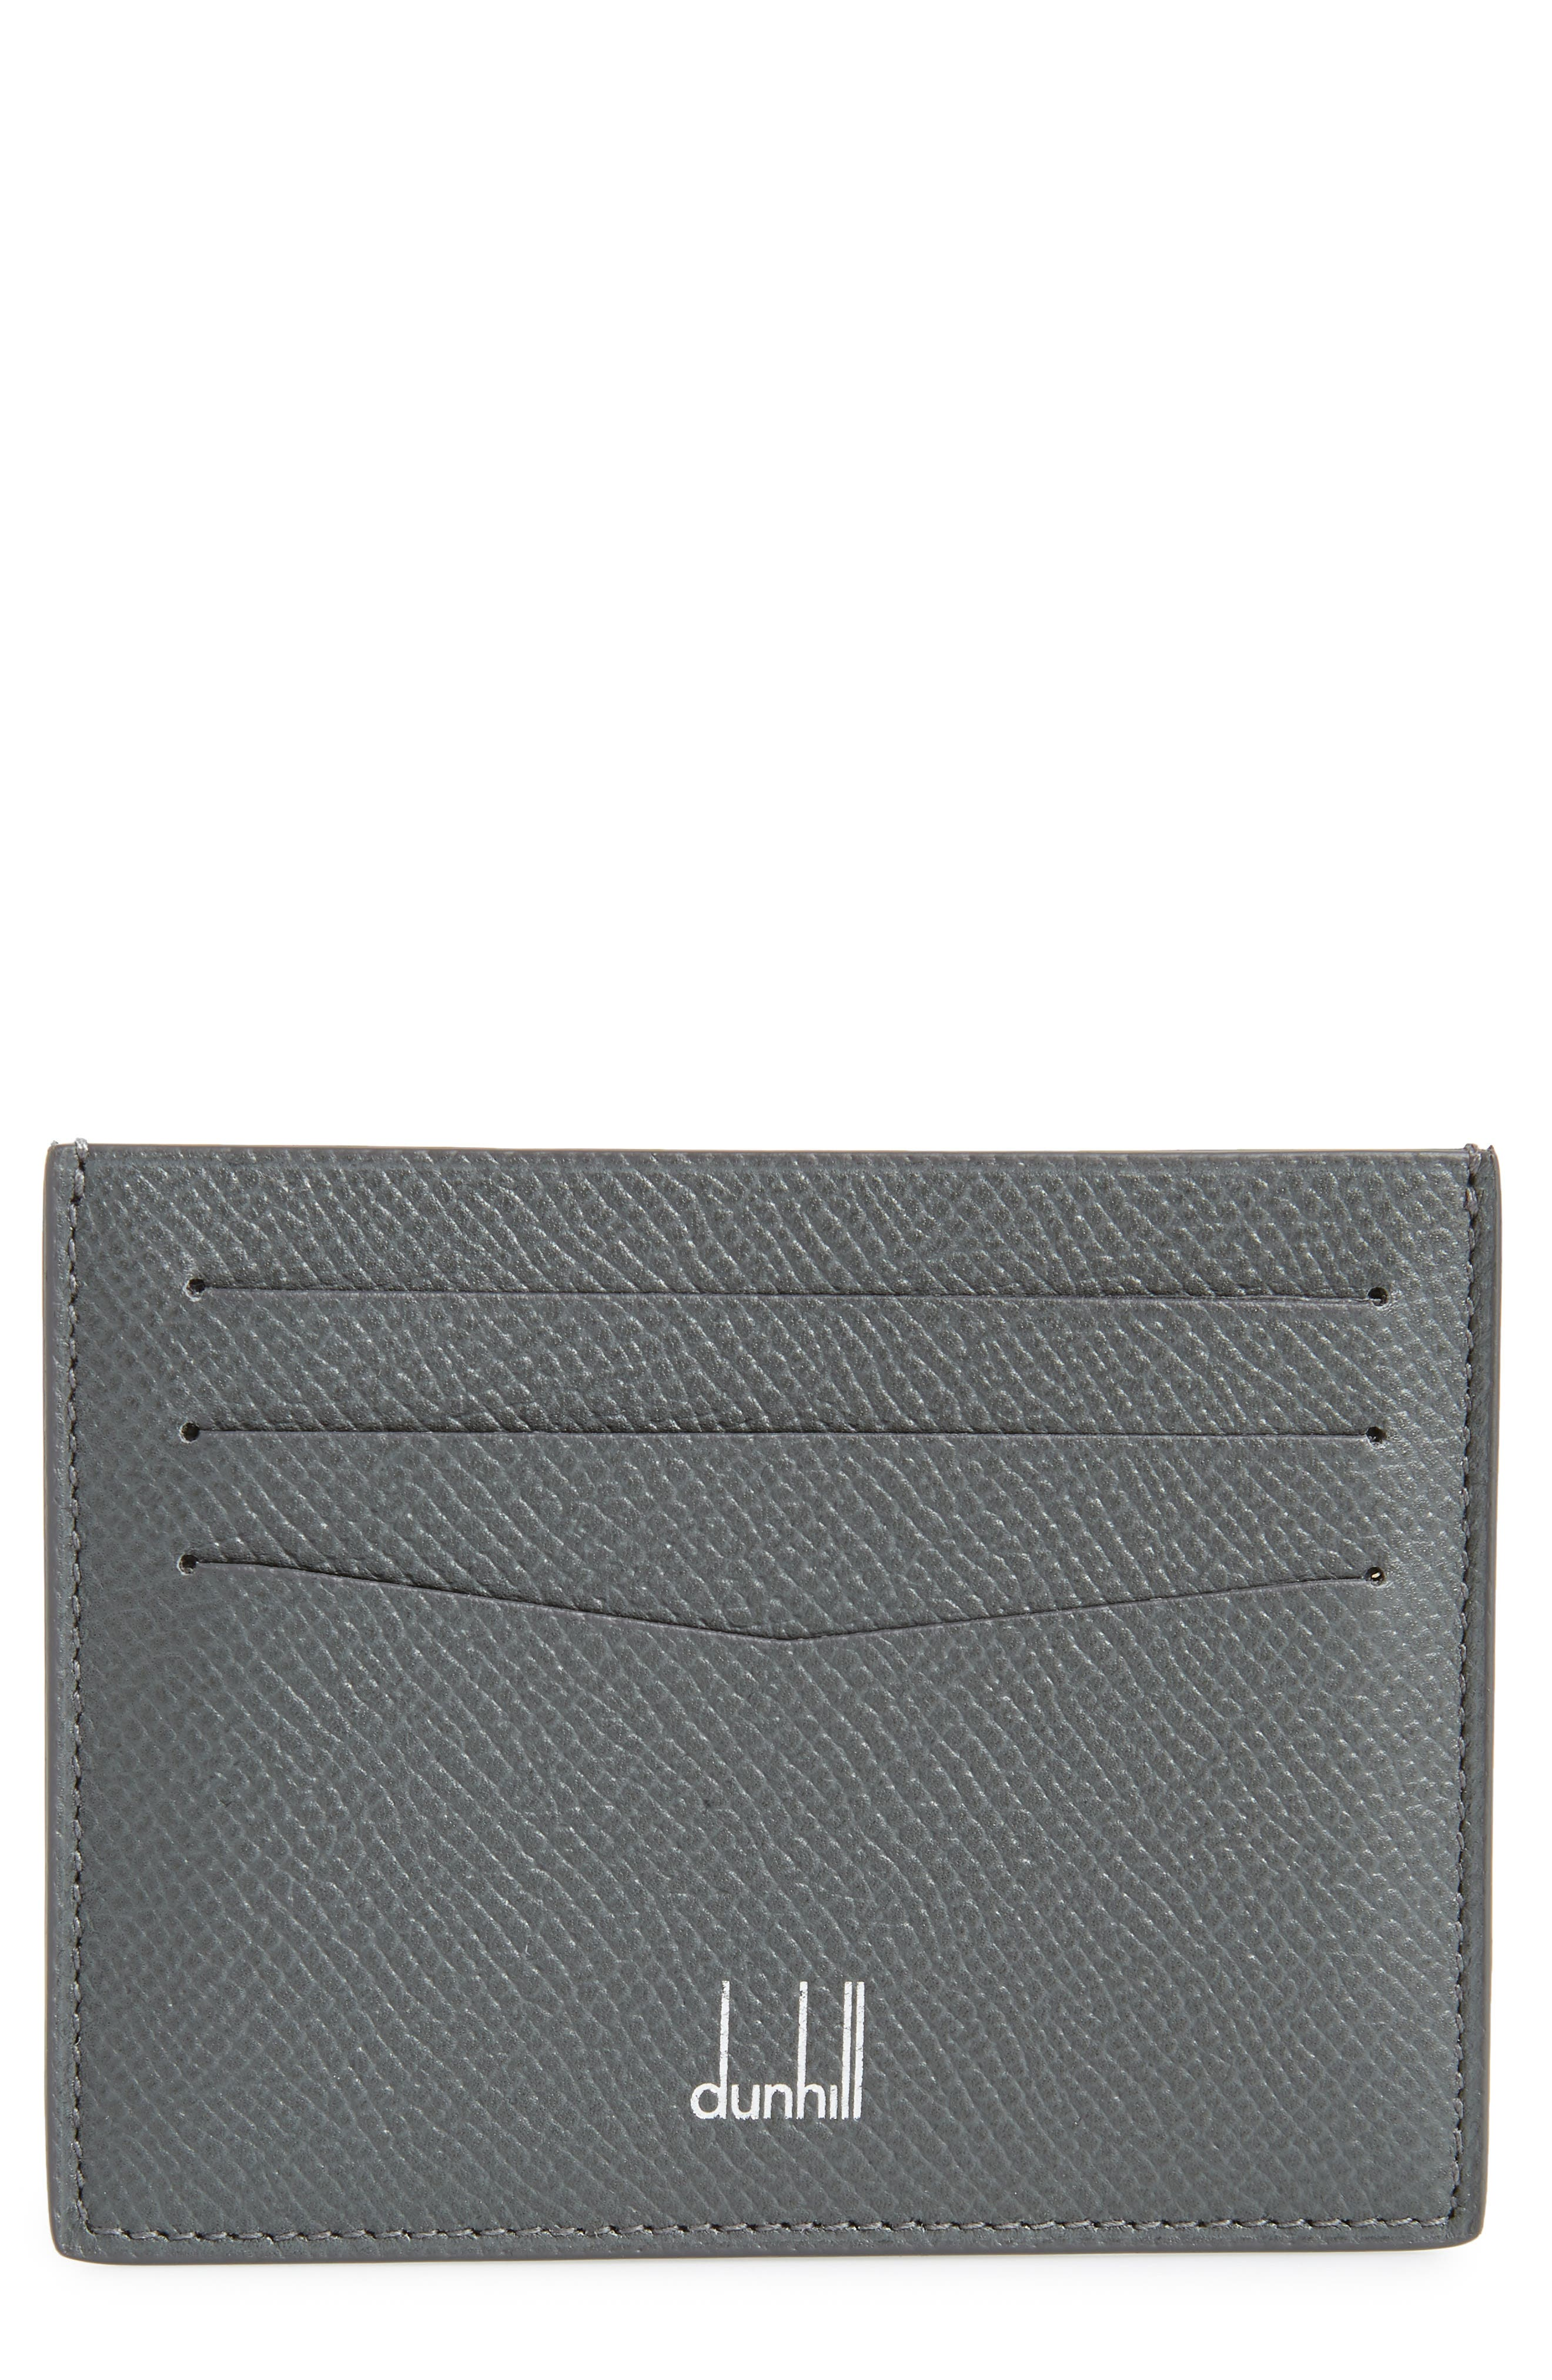 Cadogan Leather Card Case,                             Main thumbnail 1, color,                             GREY